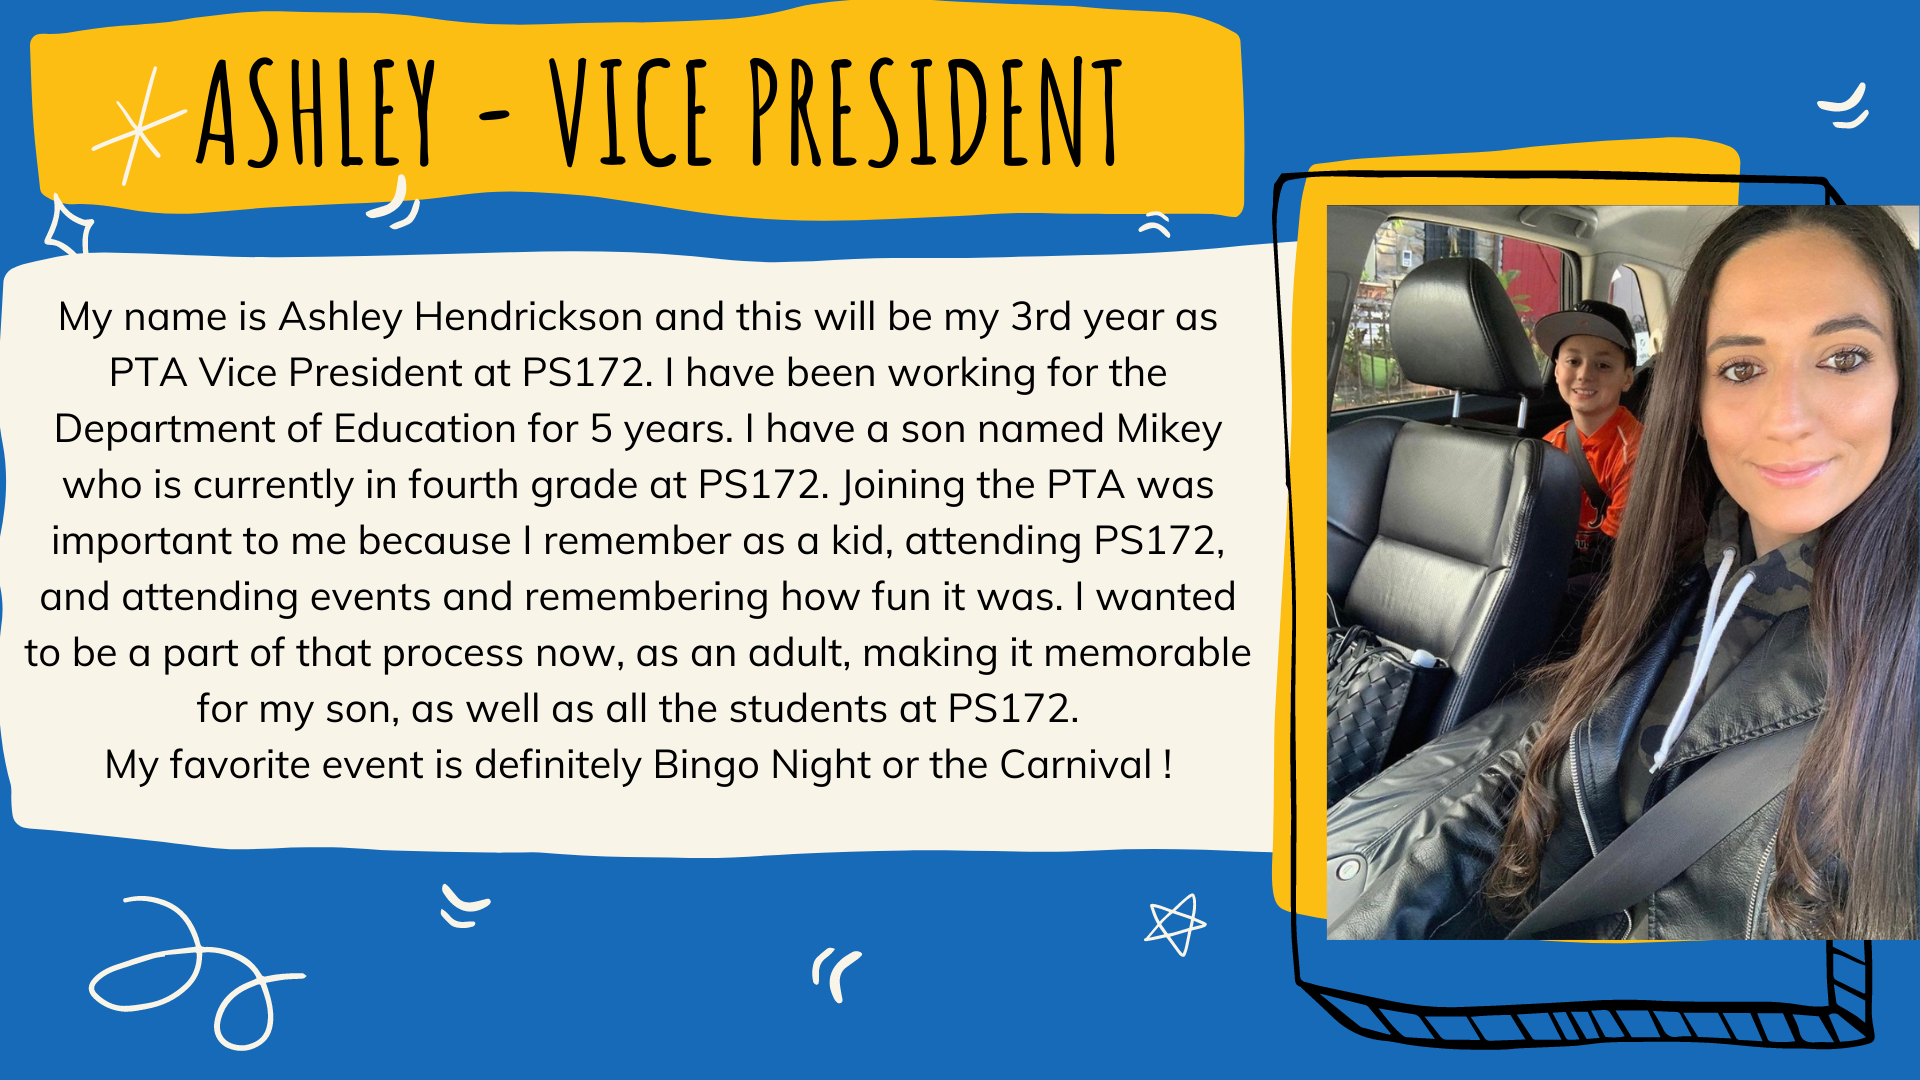 Vice President, Ashley Hendrickson